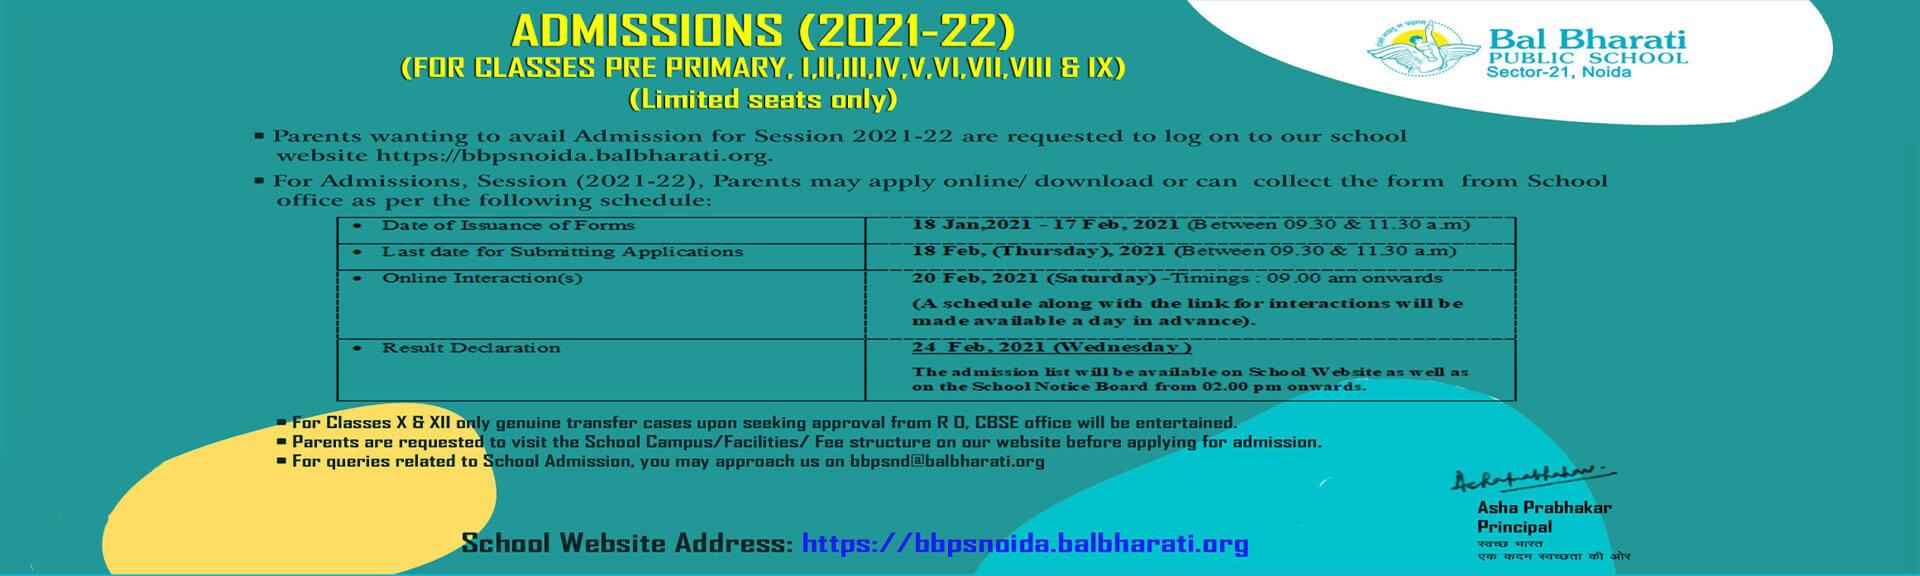 Admission21-22-New